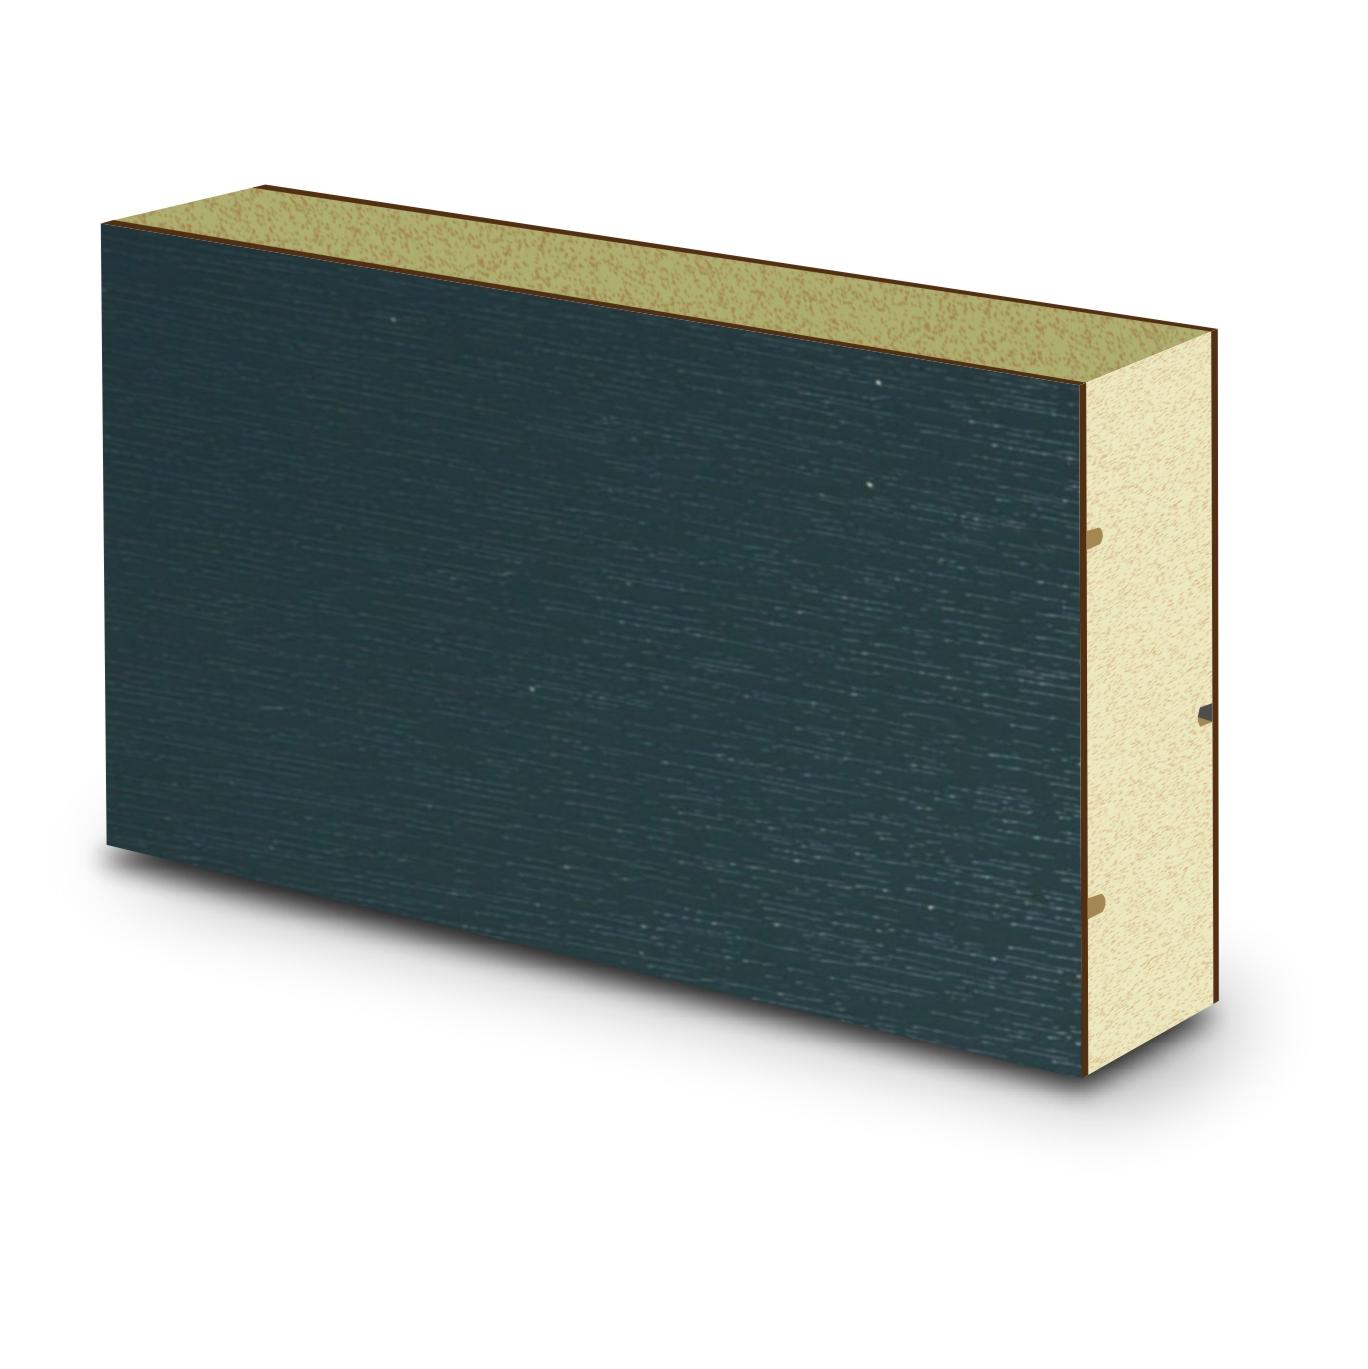 sandwich panel-9925.05-167-Renolit-992505167-Monumentengrun